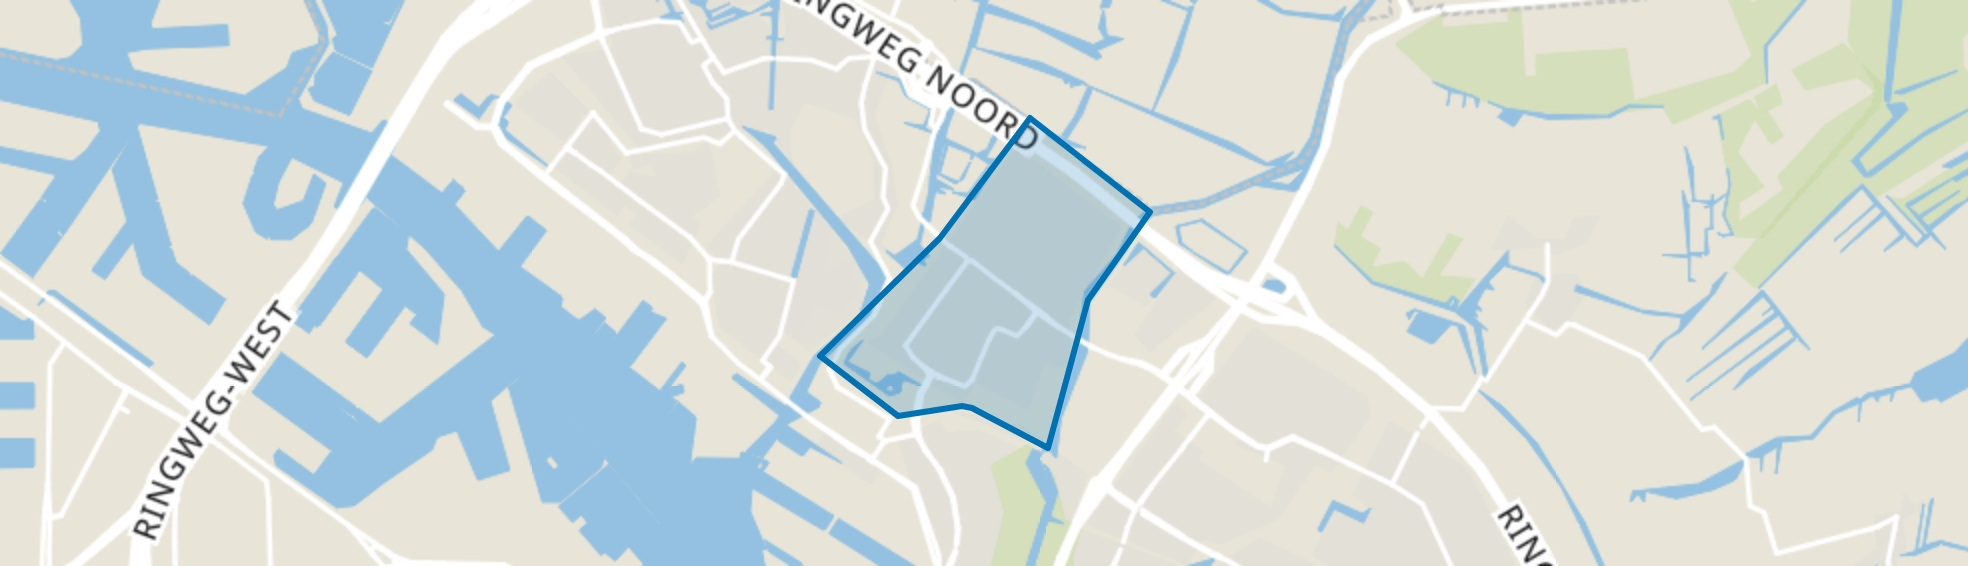 Banne Buiksloot, Amsterdam map